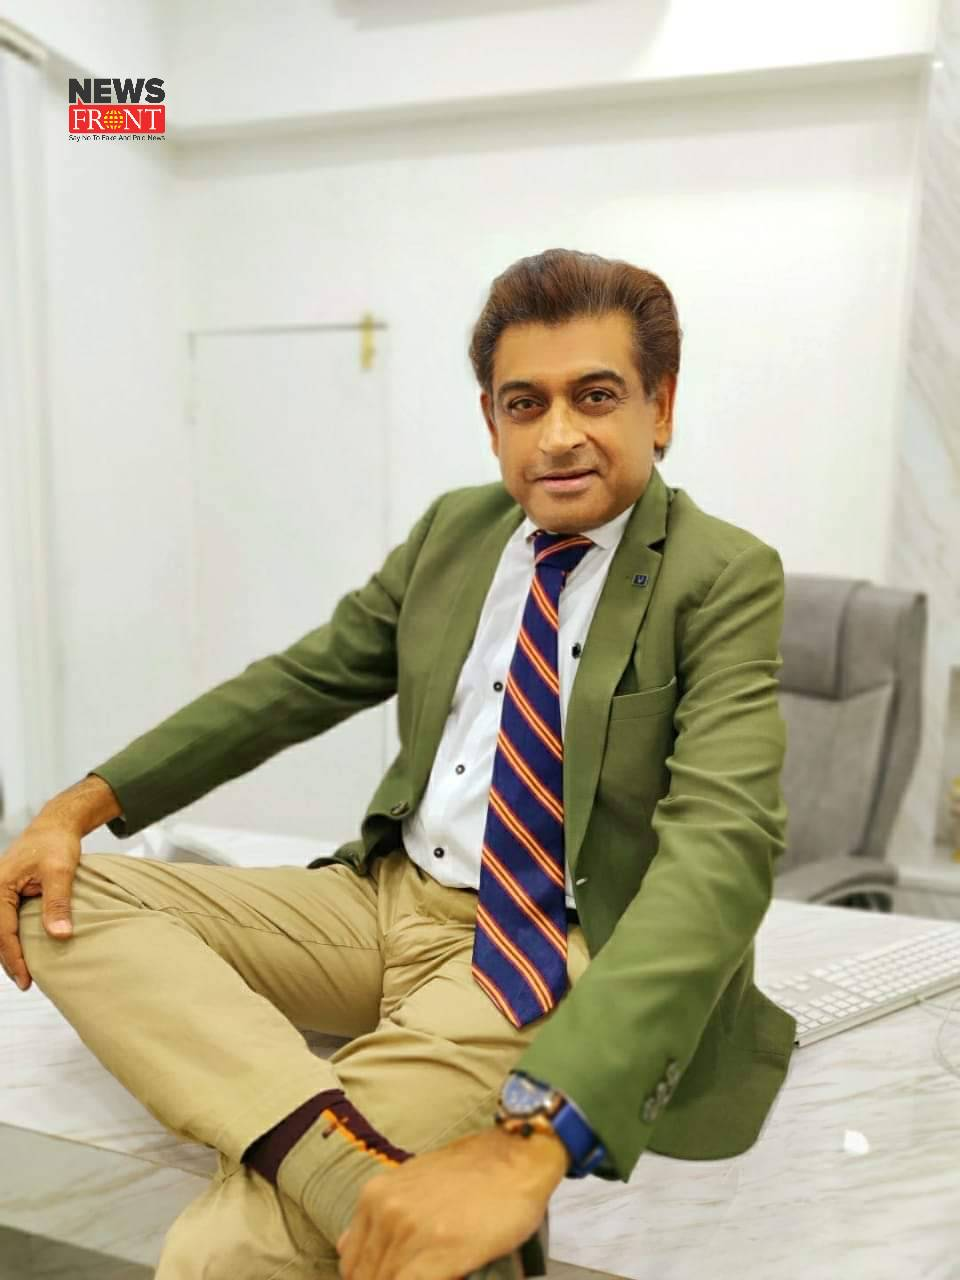 Amit Kumar   newsfront.co